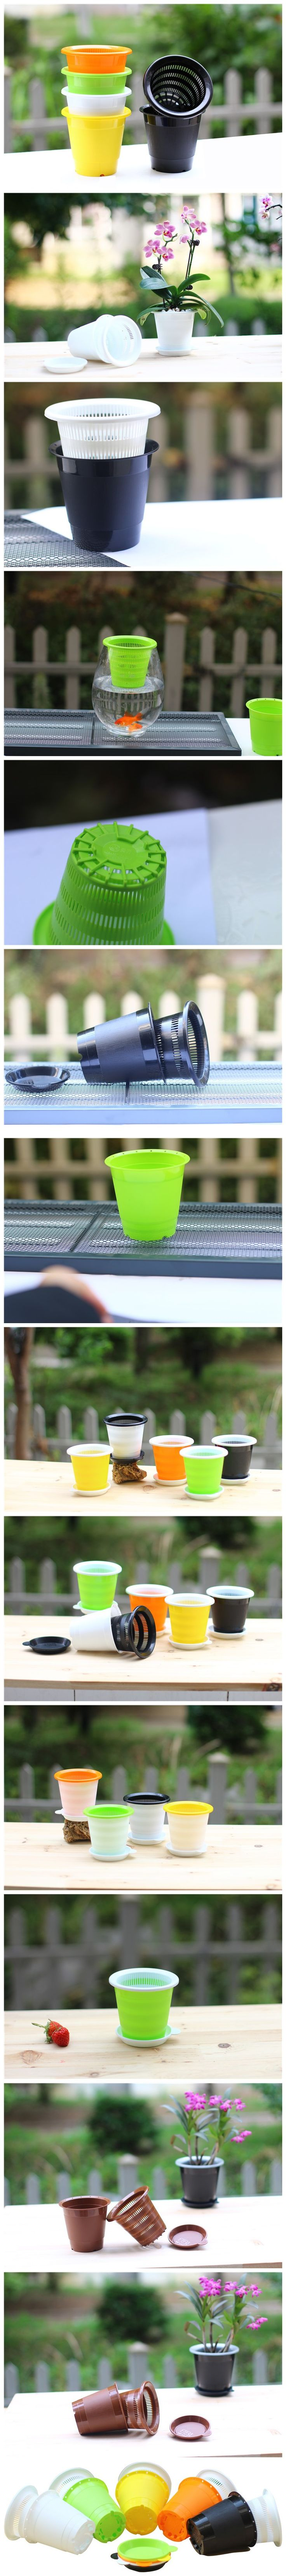 2pcs 7 Inch Pot 1pc 6 Inch Pot Meshpot Clear Plastic Orchid Pots